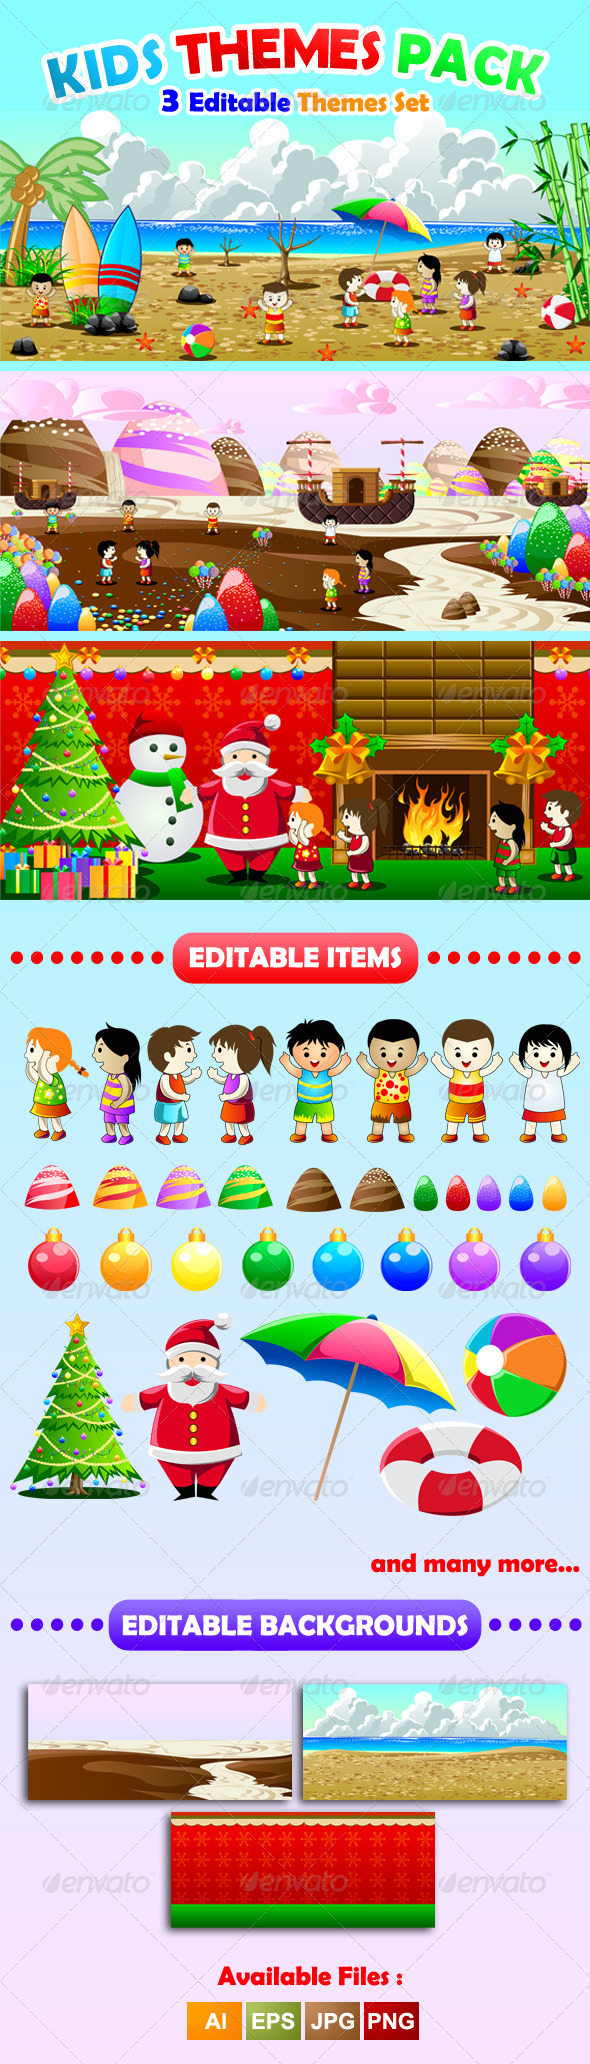 Kids Theme Pack